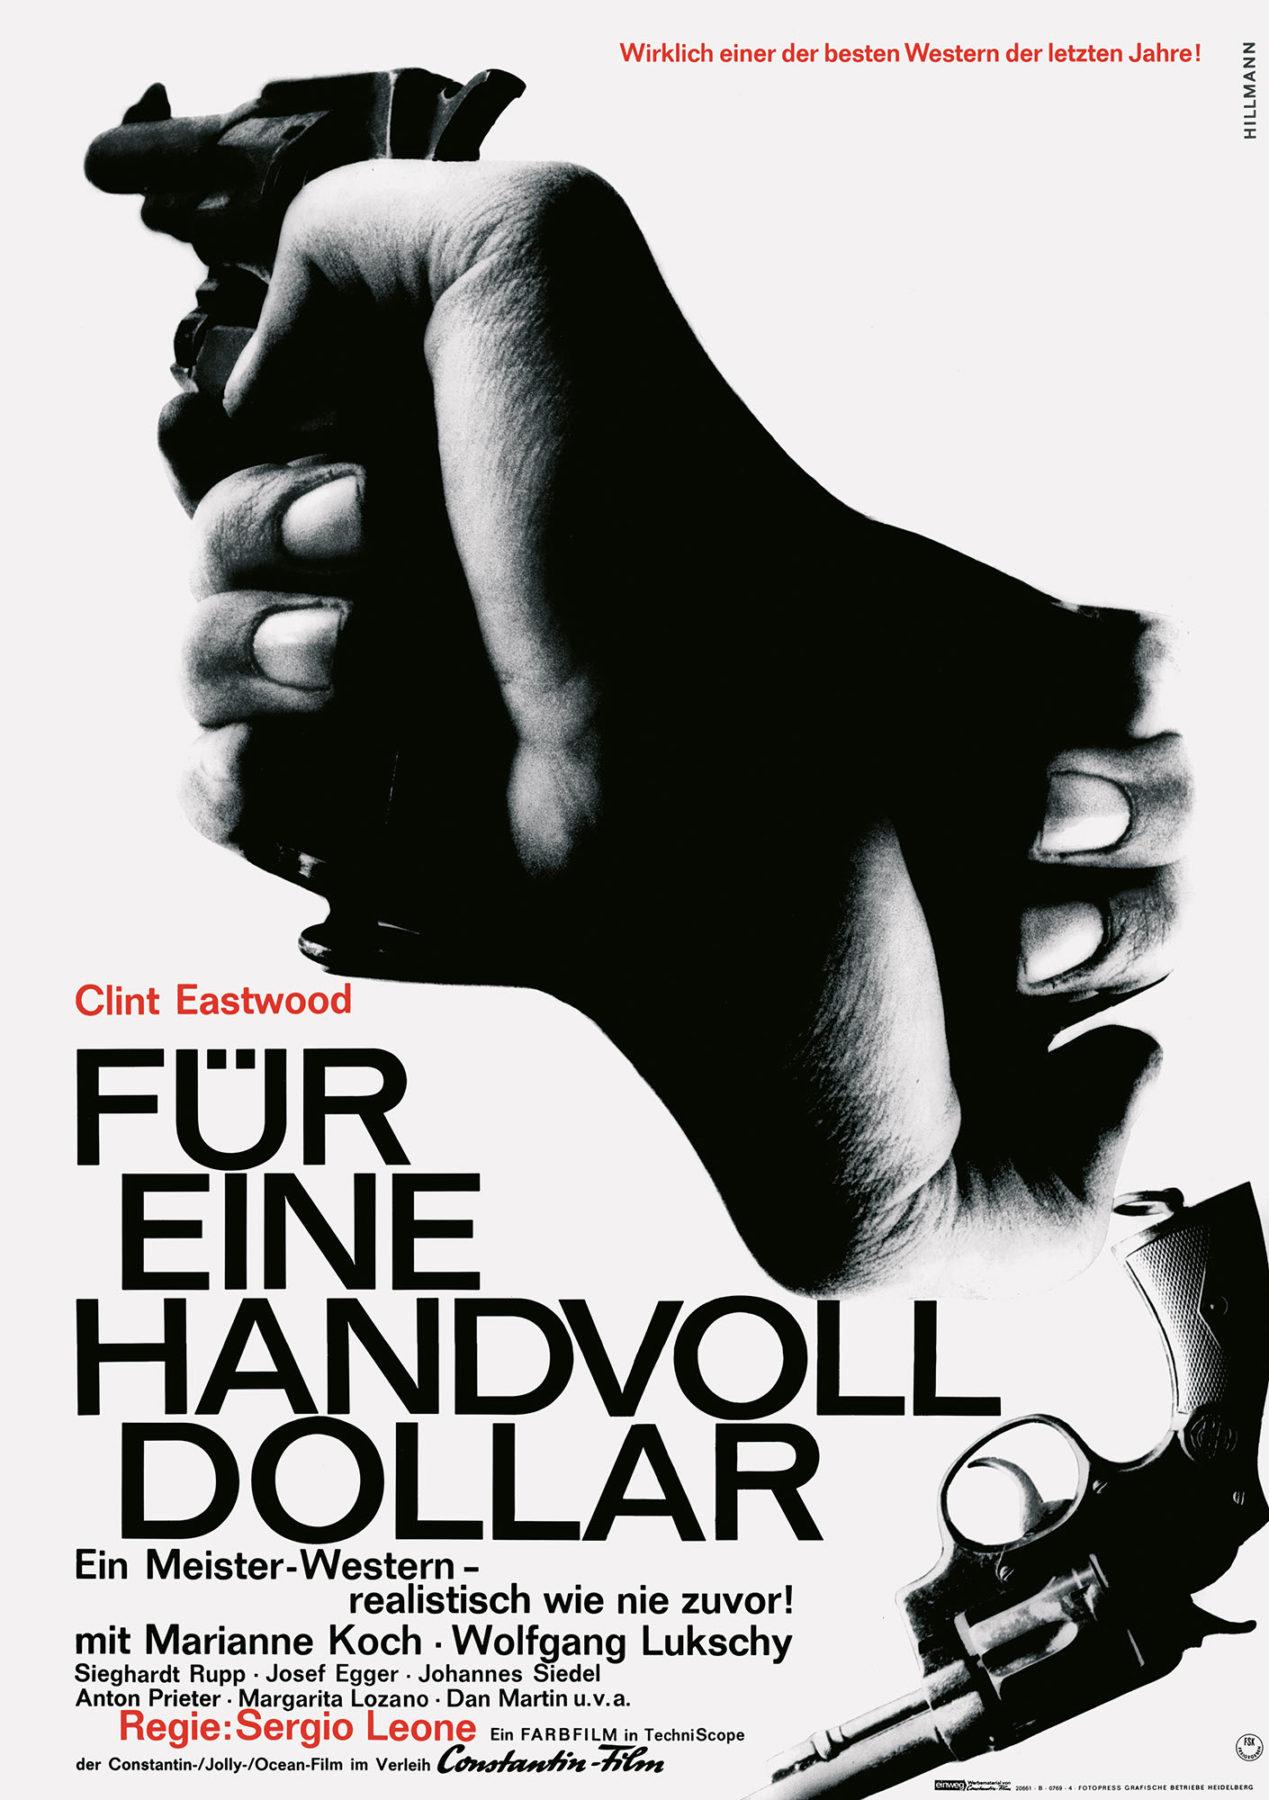 Hillmann 1965 Fuer eine Handvoll Dollar Constantin Film Plakat A1 A